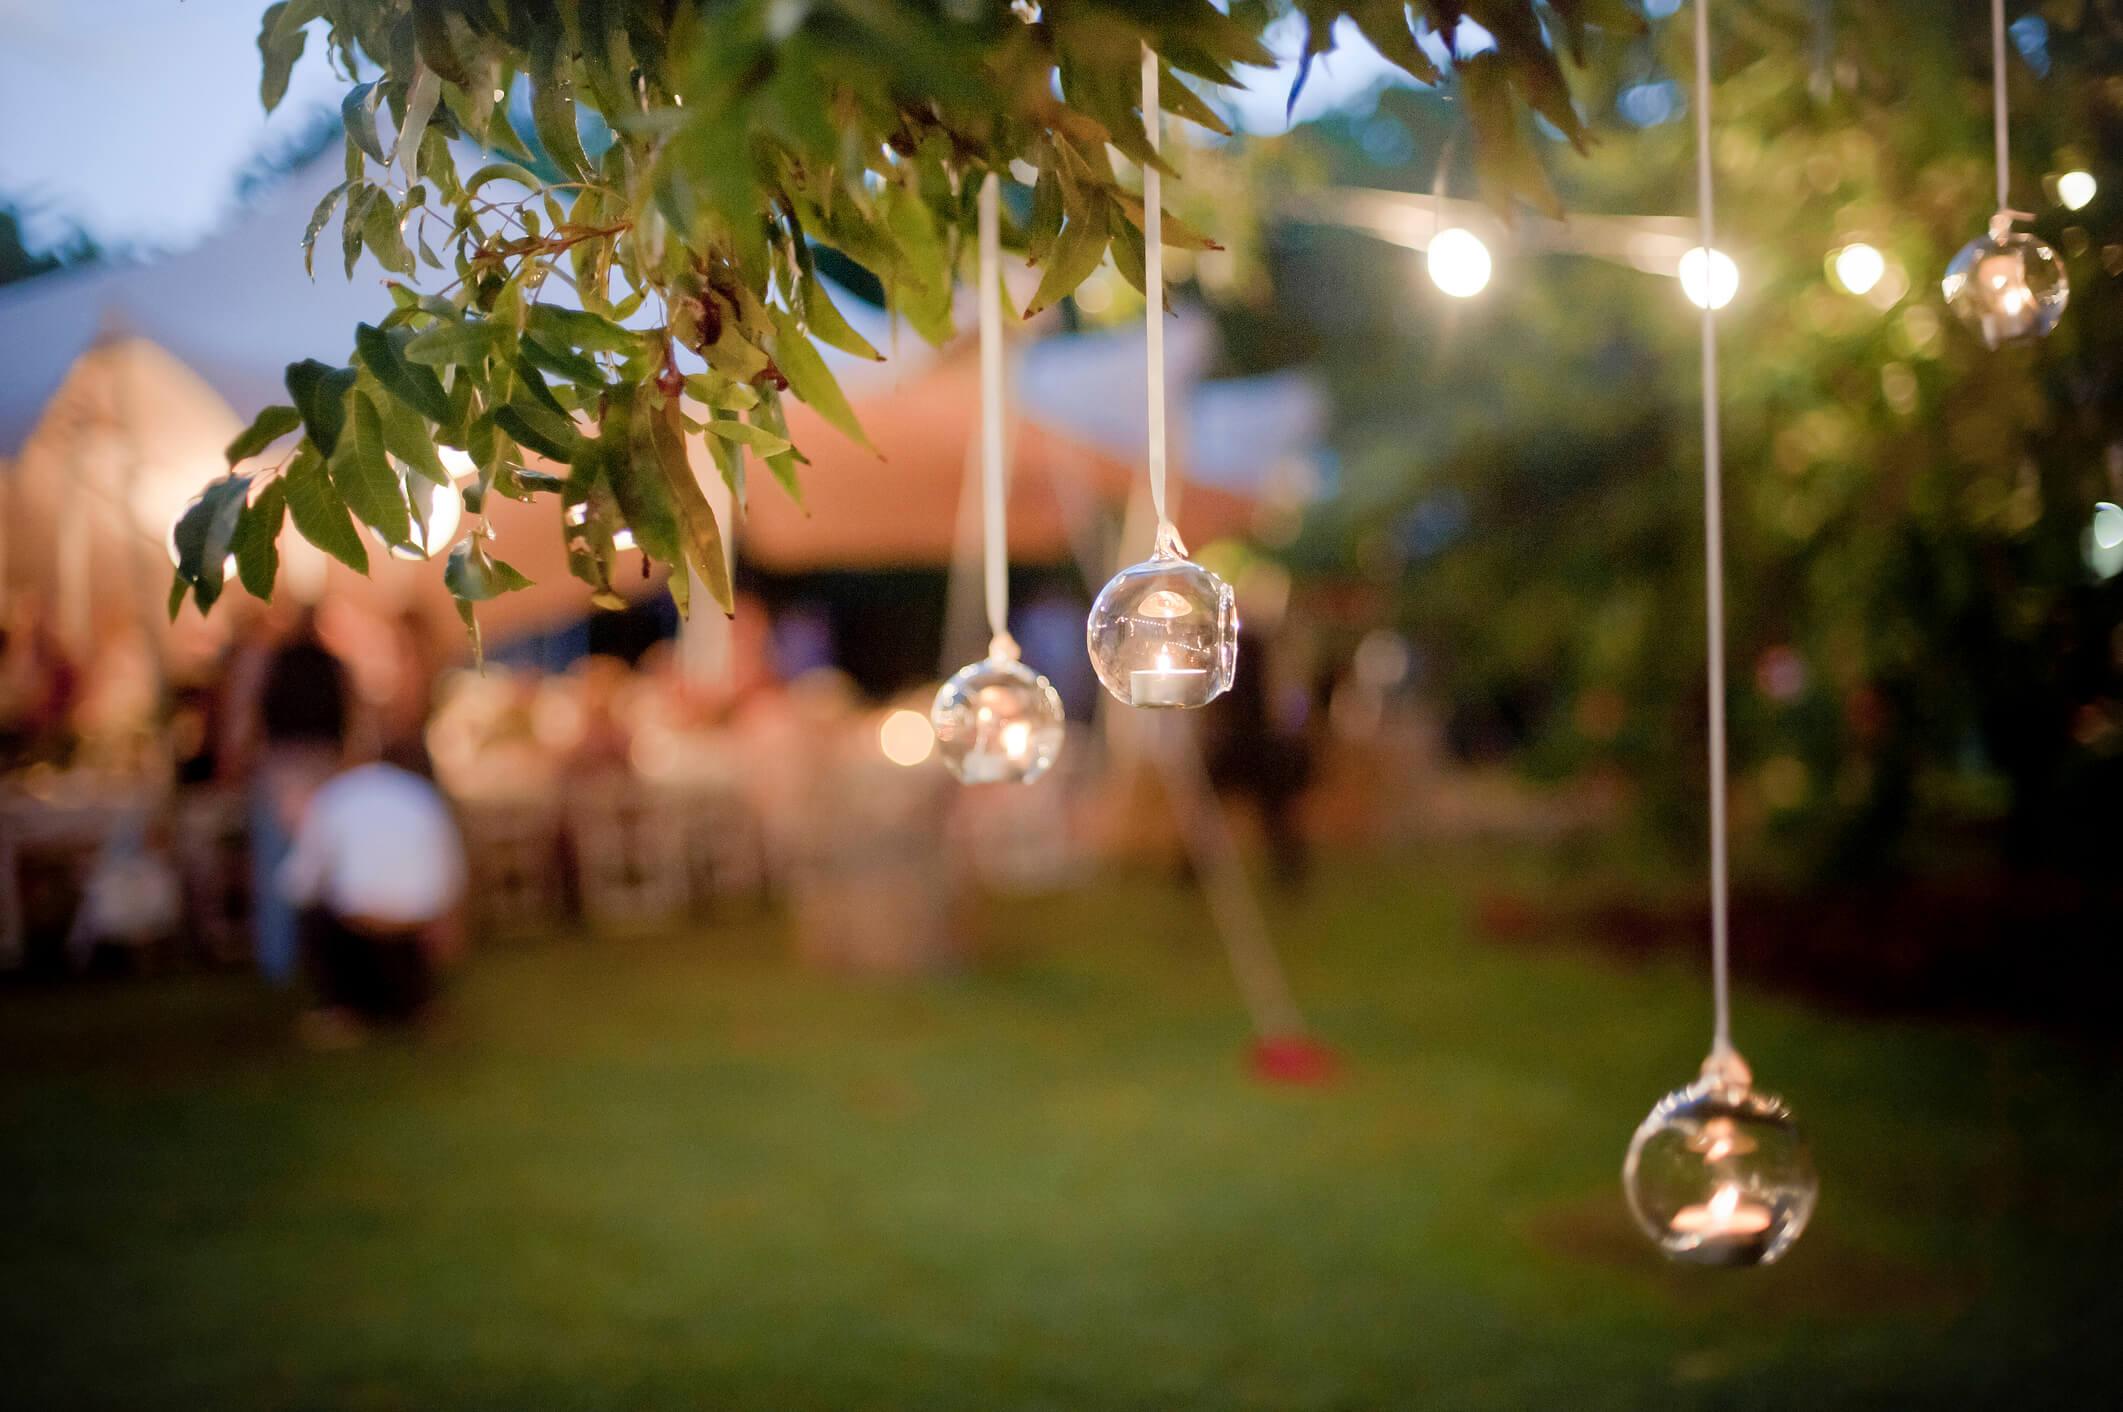 How I Saved More Than $1,600 on My Wedding: Decor